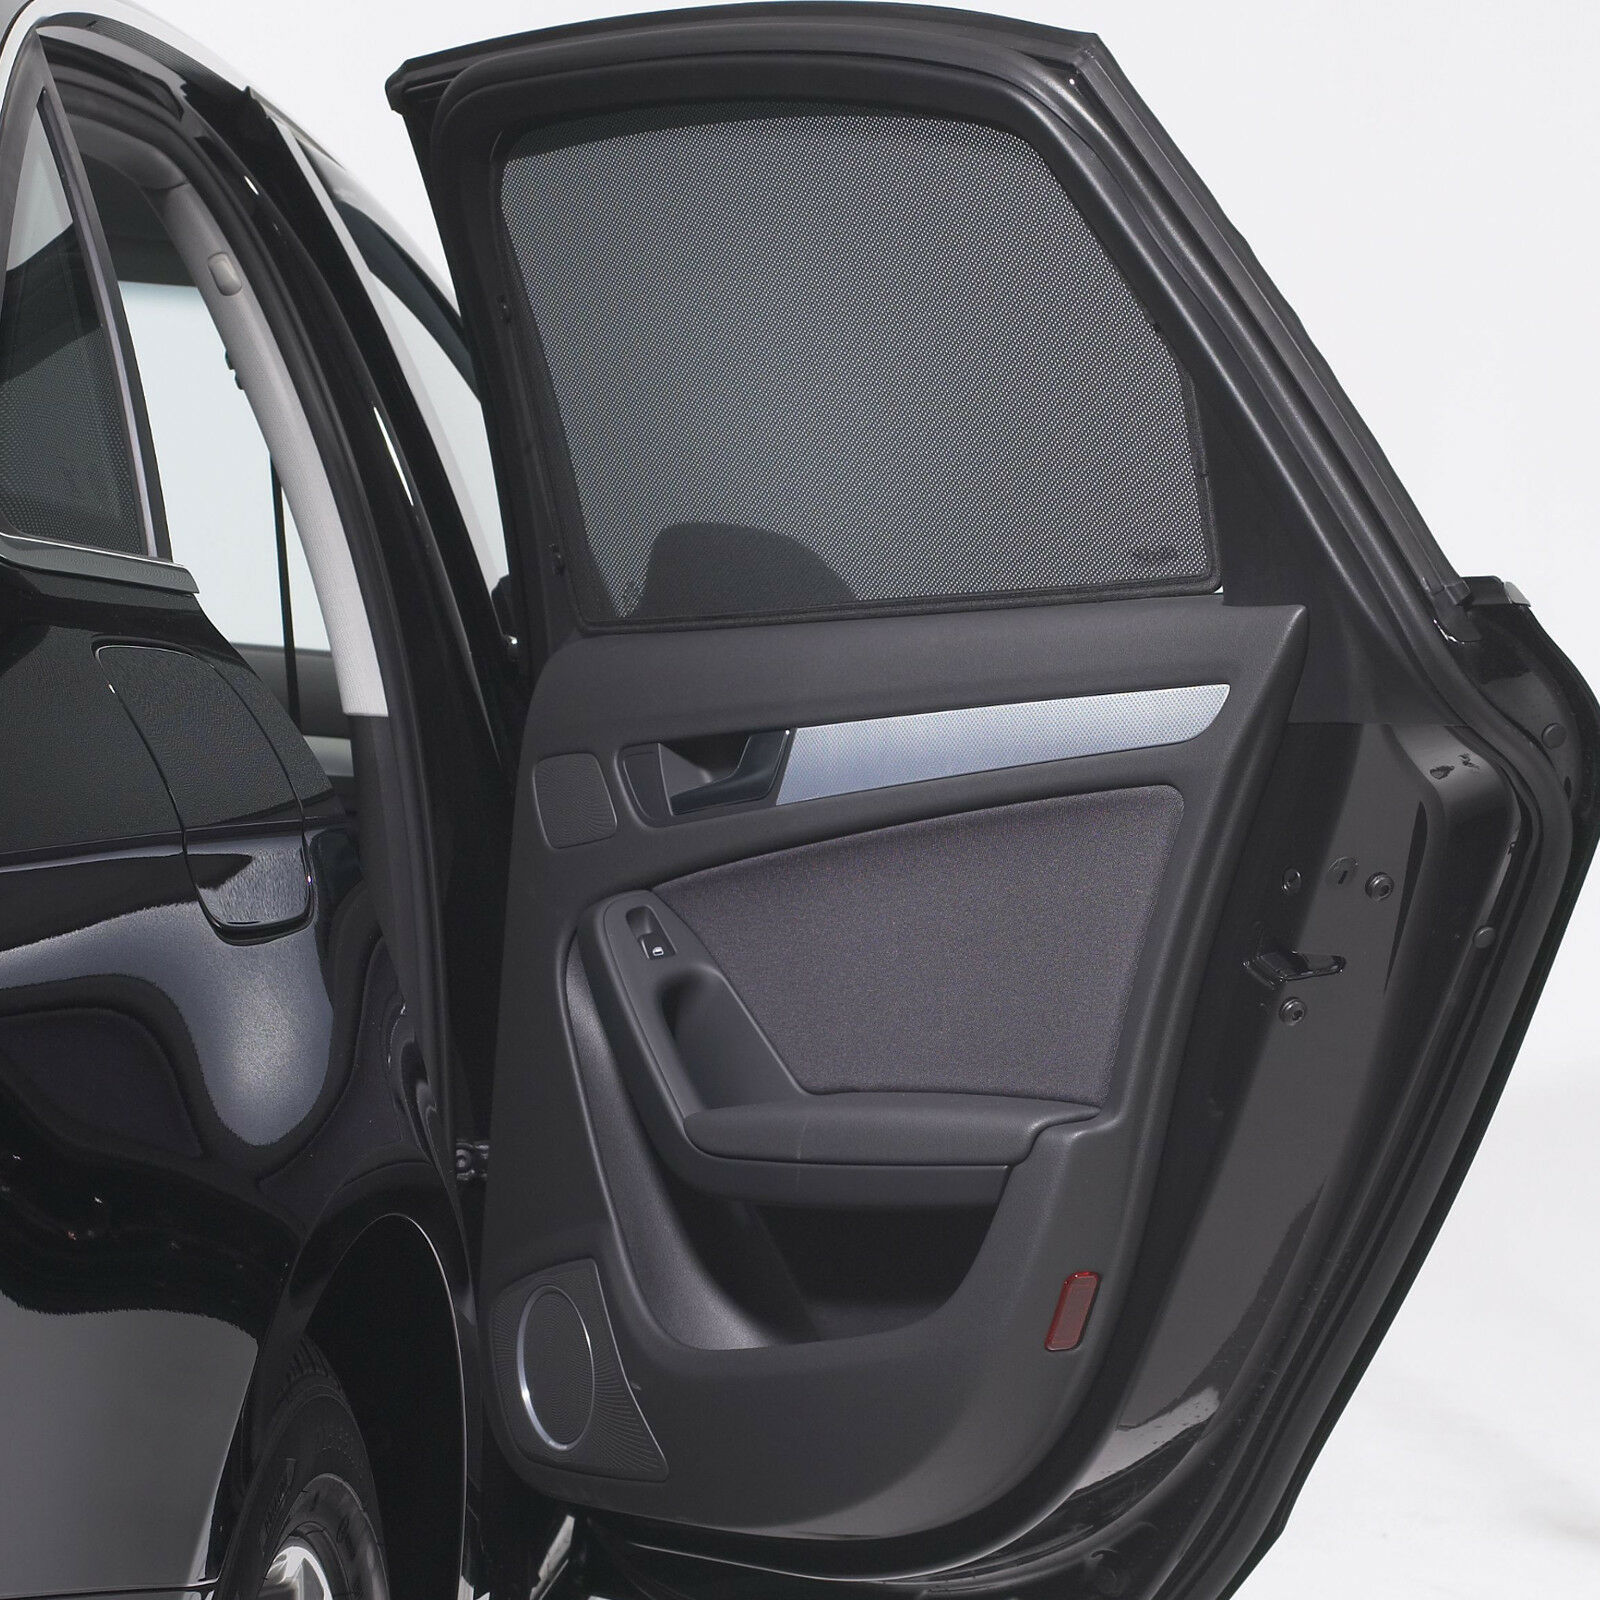 ClimAir Sonniboy Opel Zafira B Typ A/H 2005-2015 Sonnenschutz Sichtschutz Sichtschutz Sonnenschutz 5tl c84329